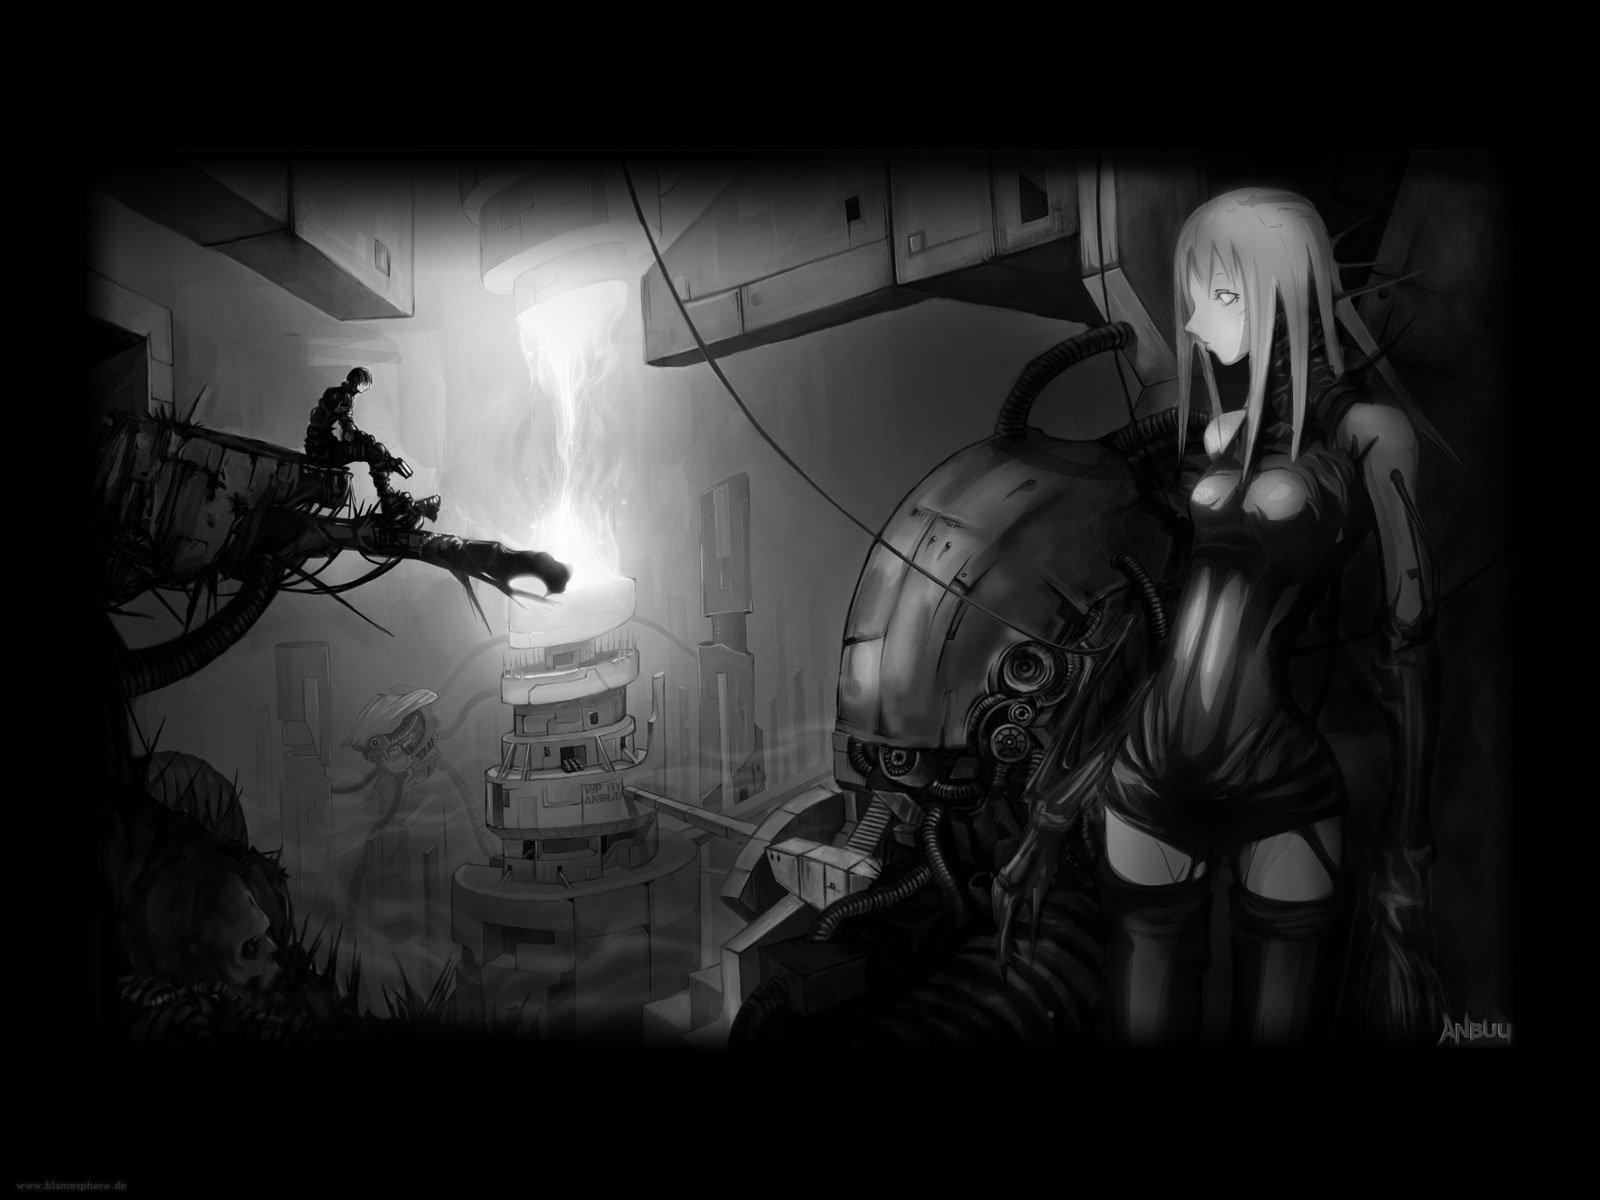 Anime 1600x1200 cyberpunk Blame! anime girls anime boys dystopian monochrome Killy Cibo